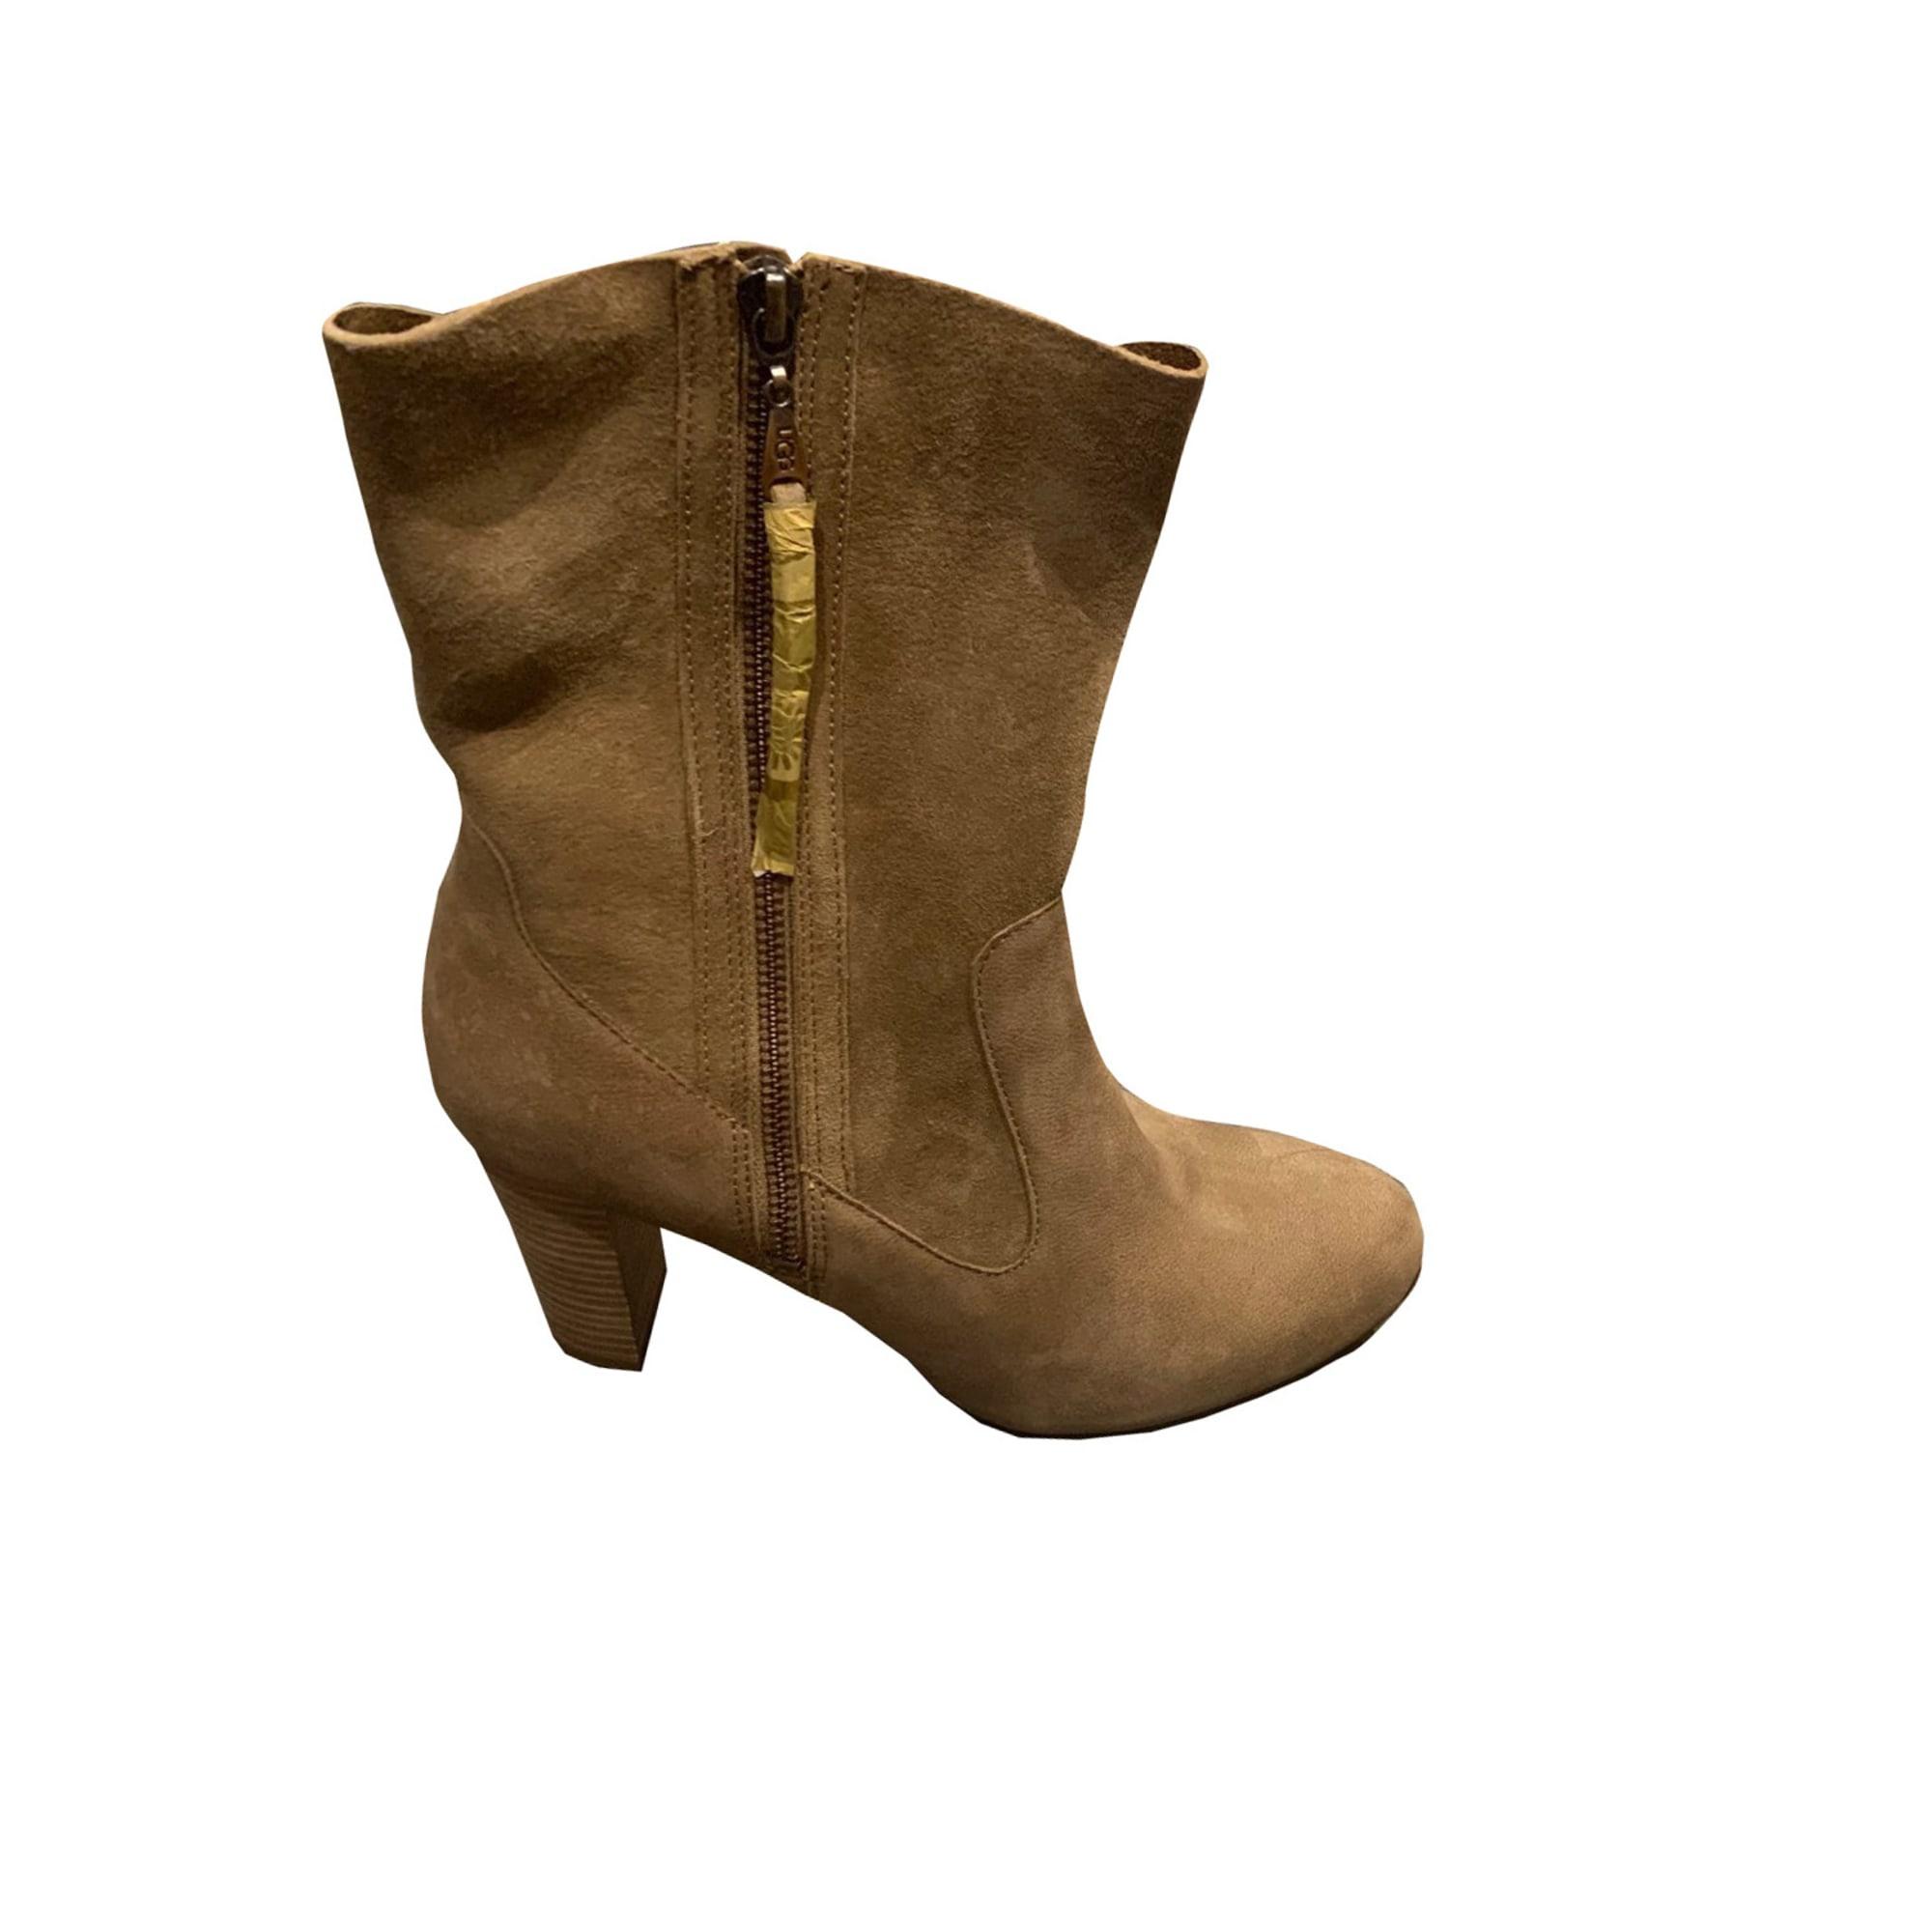 Bottines & low boots à talons UGG Beige, camel